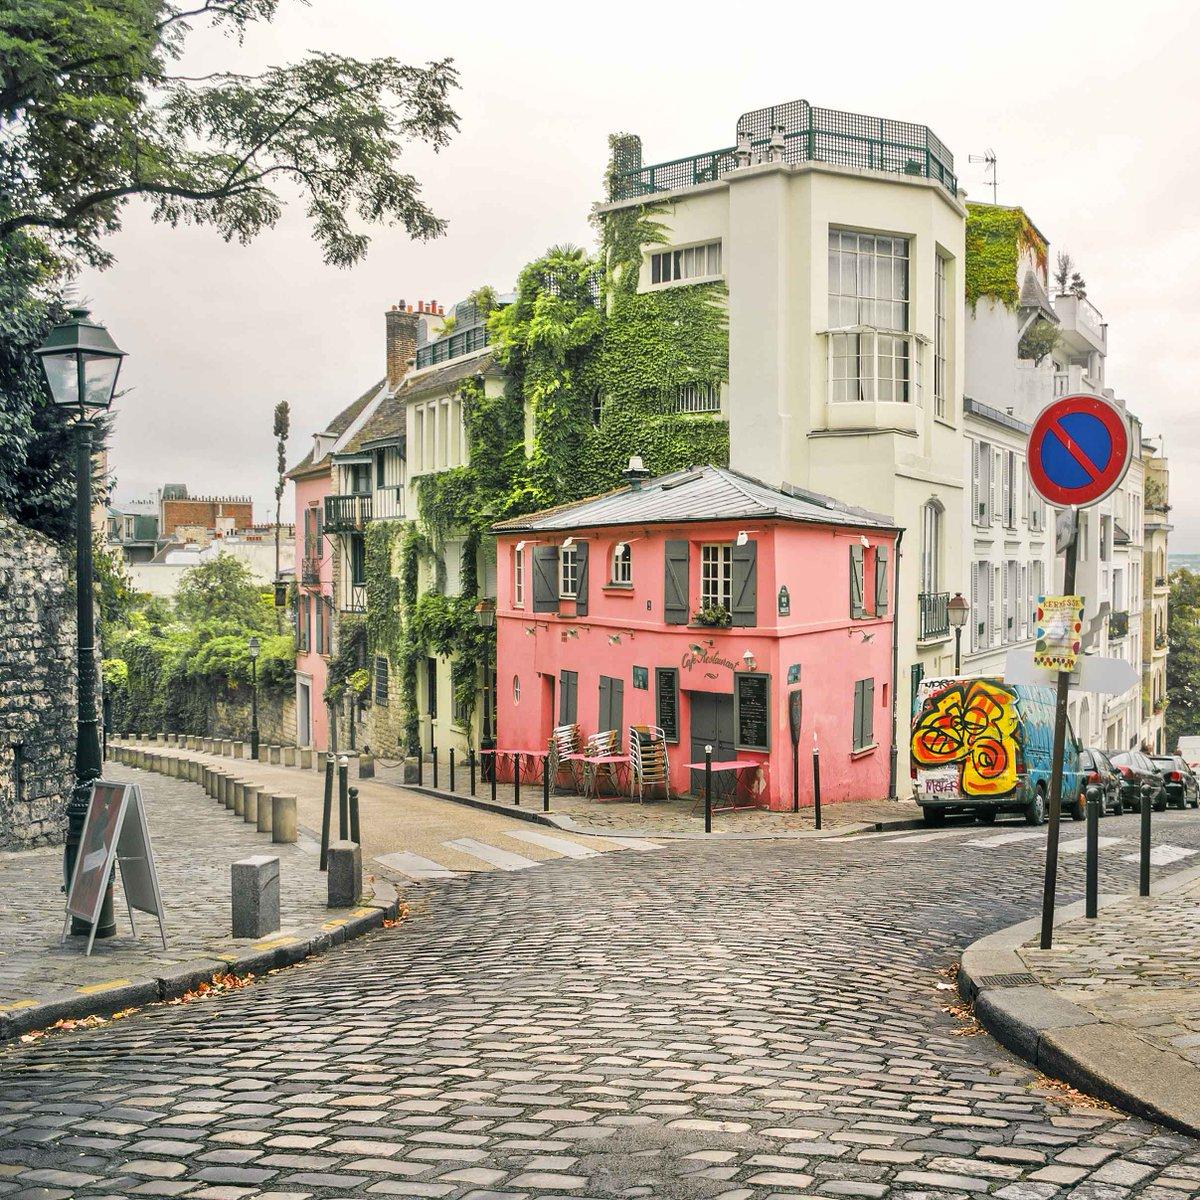 The streets of Montmartre, Paris. http://t.co/2iNfZou3ey